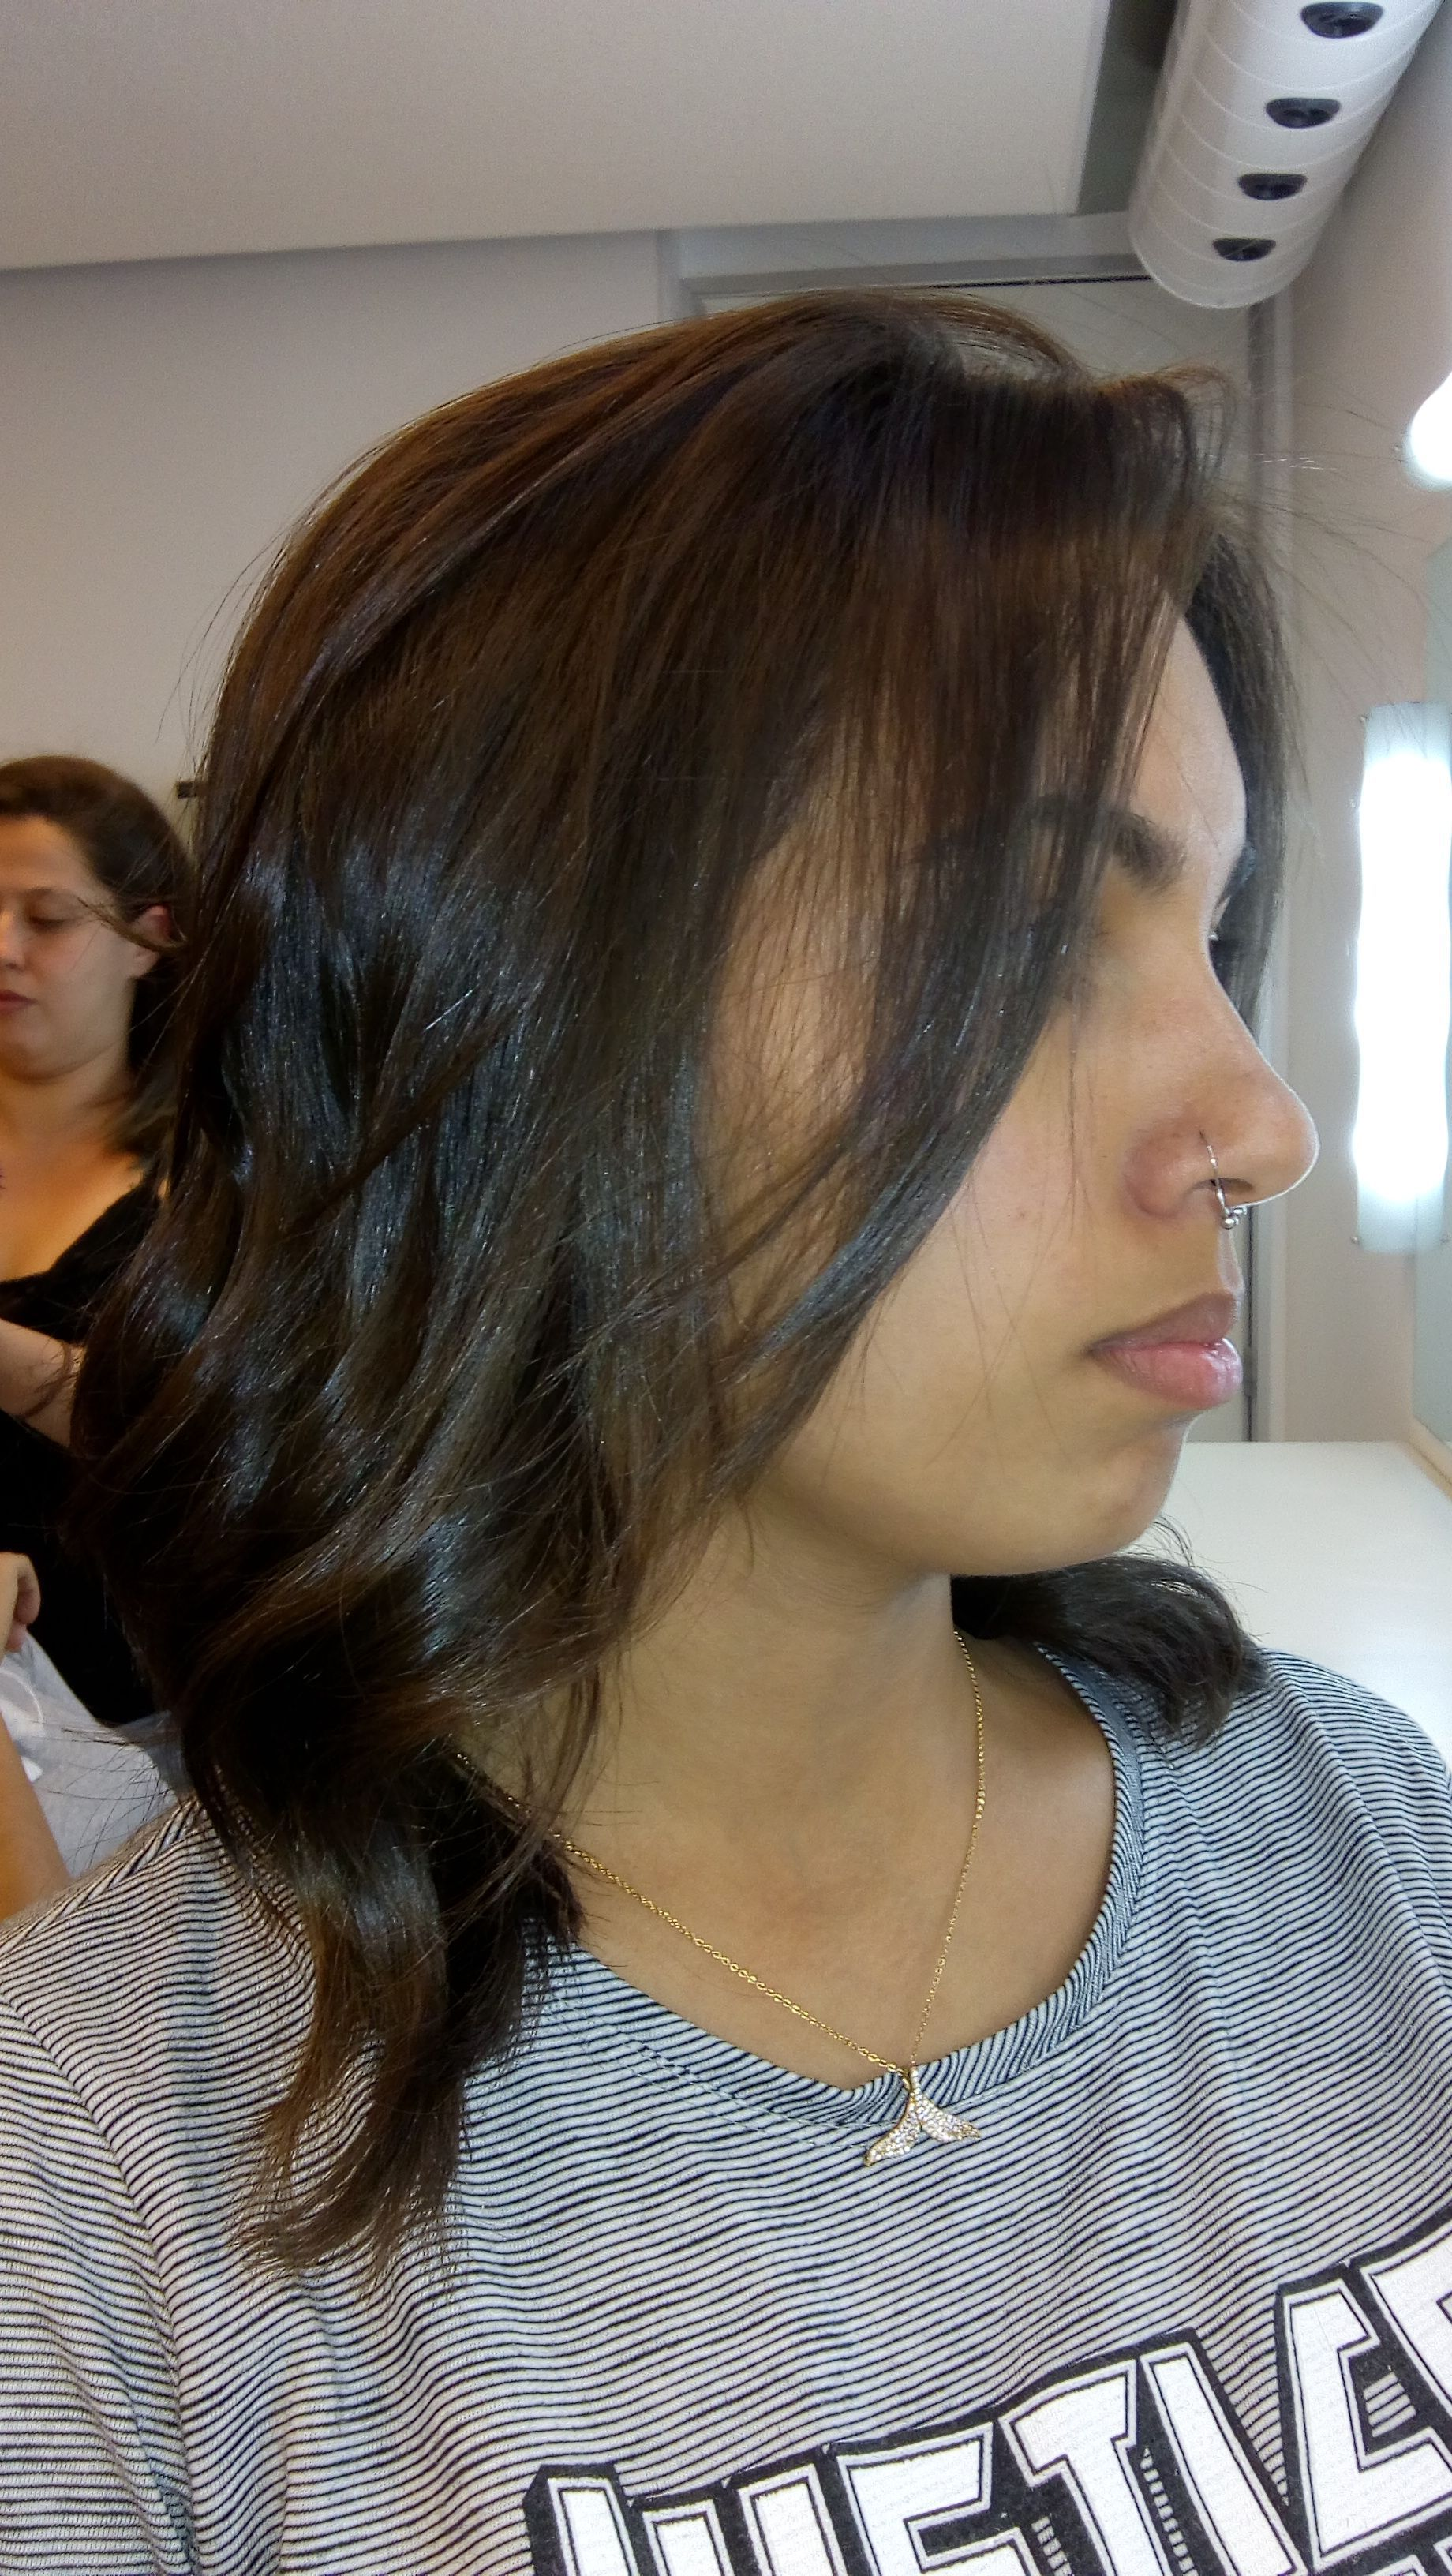 Escova cacheada cabelo auxiliar cabeleireiro(a) auxiliar cabeleireiro(a) auxiliar cabeleireiro(a) cabeleireiro(a) maquiador(a)